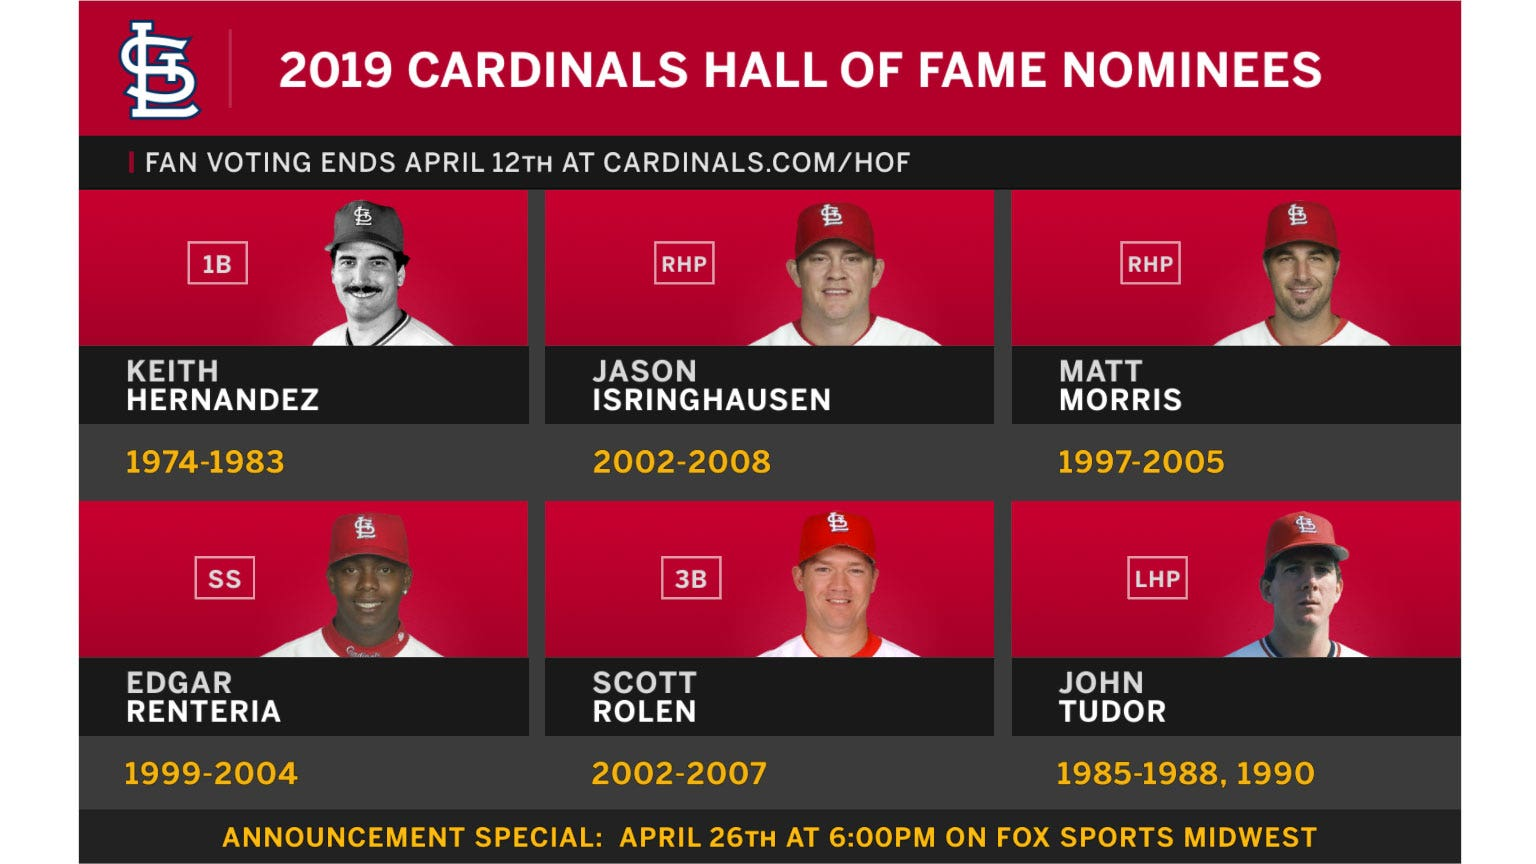 Cardinals Hall of Fame nominees: Hernandez, Isringhausen